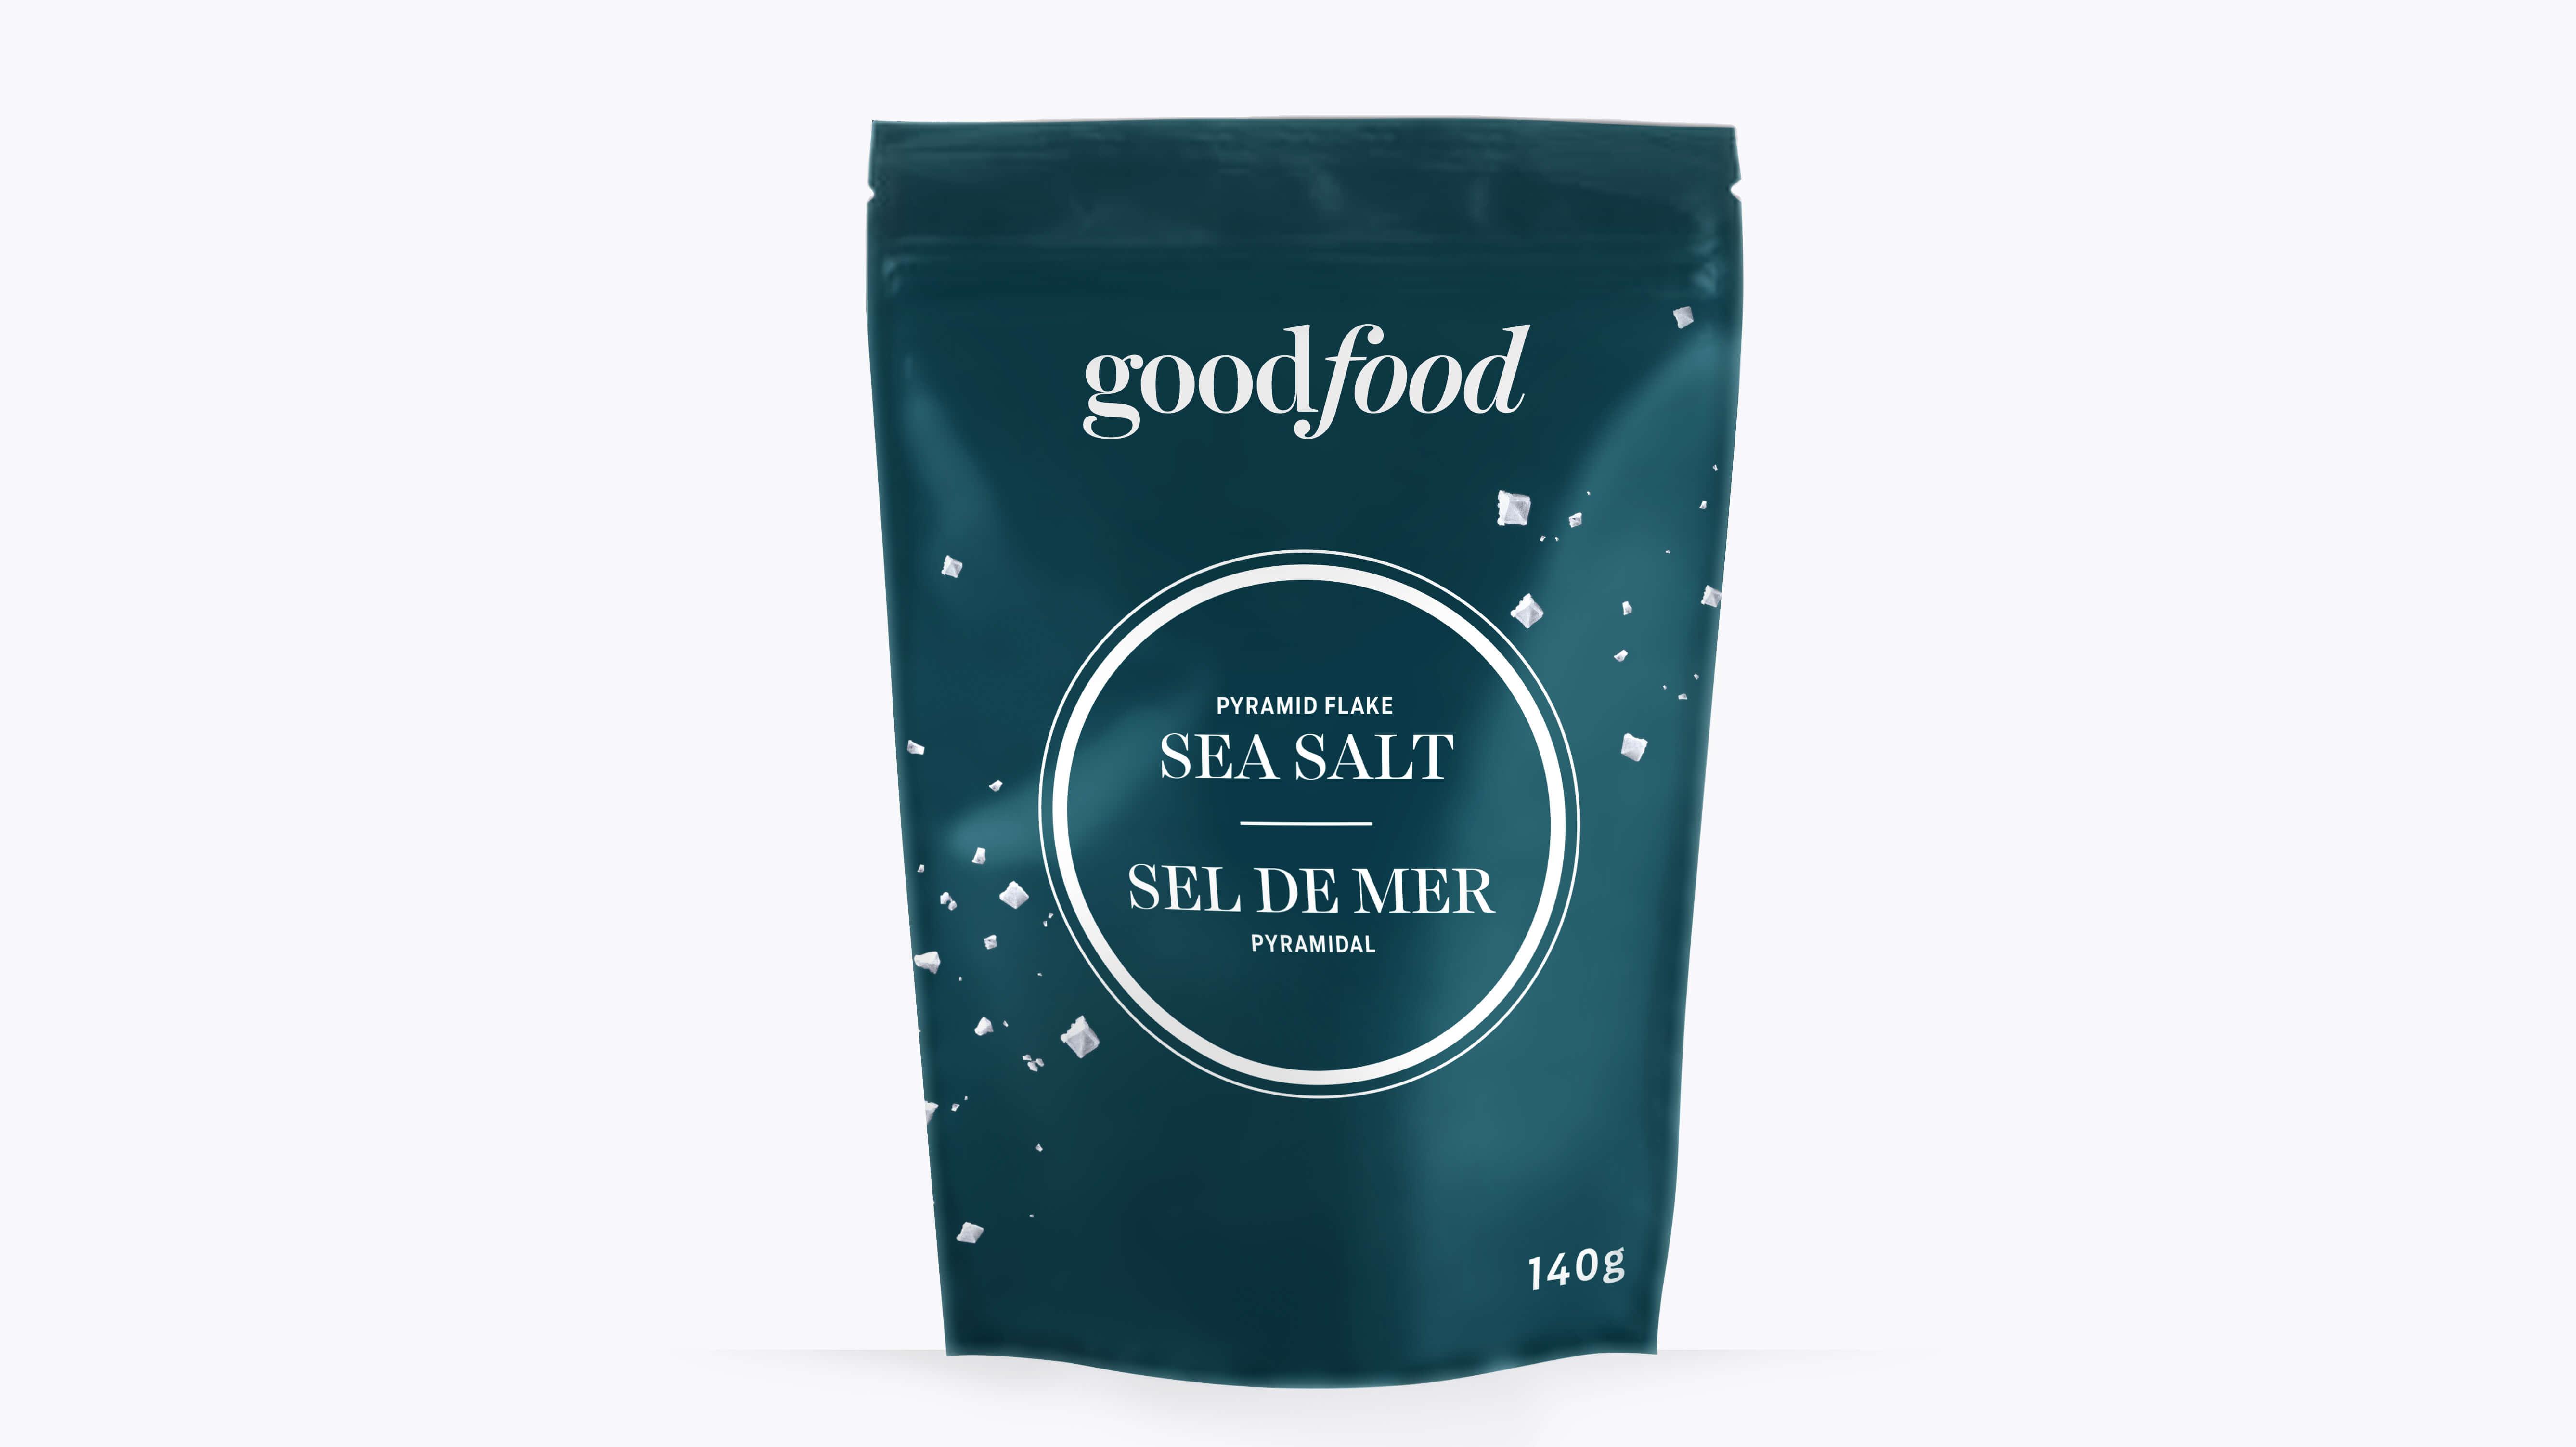 A bag of Goodfood sea salt